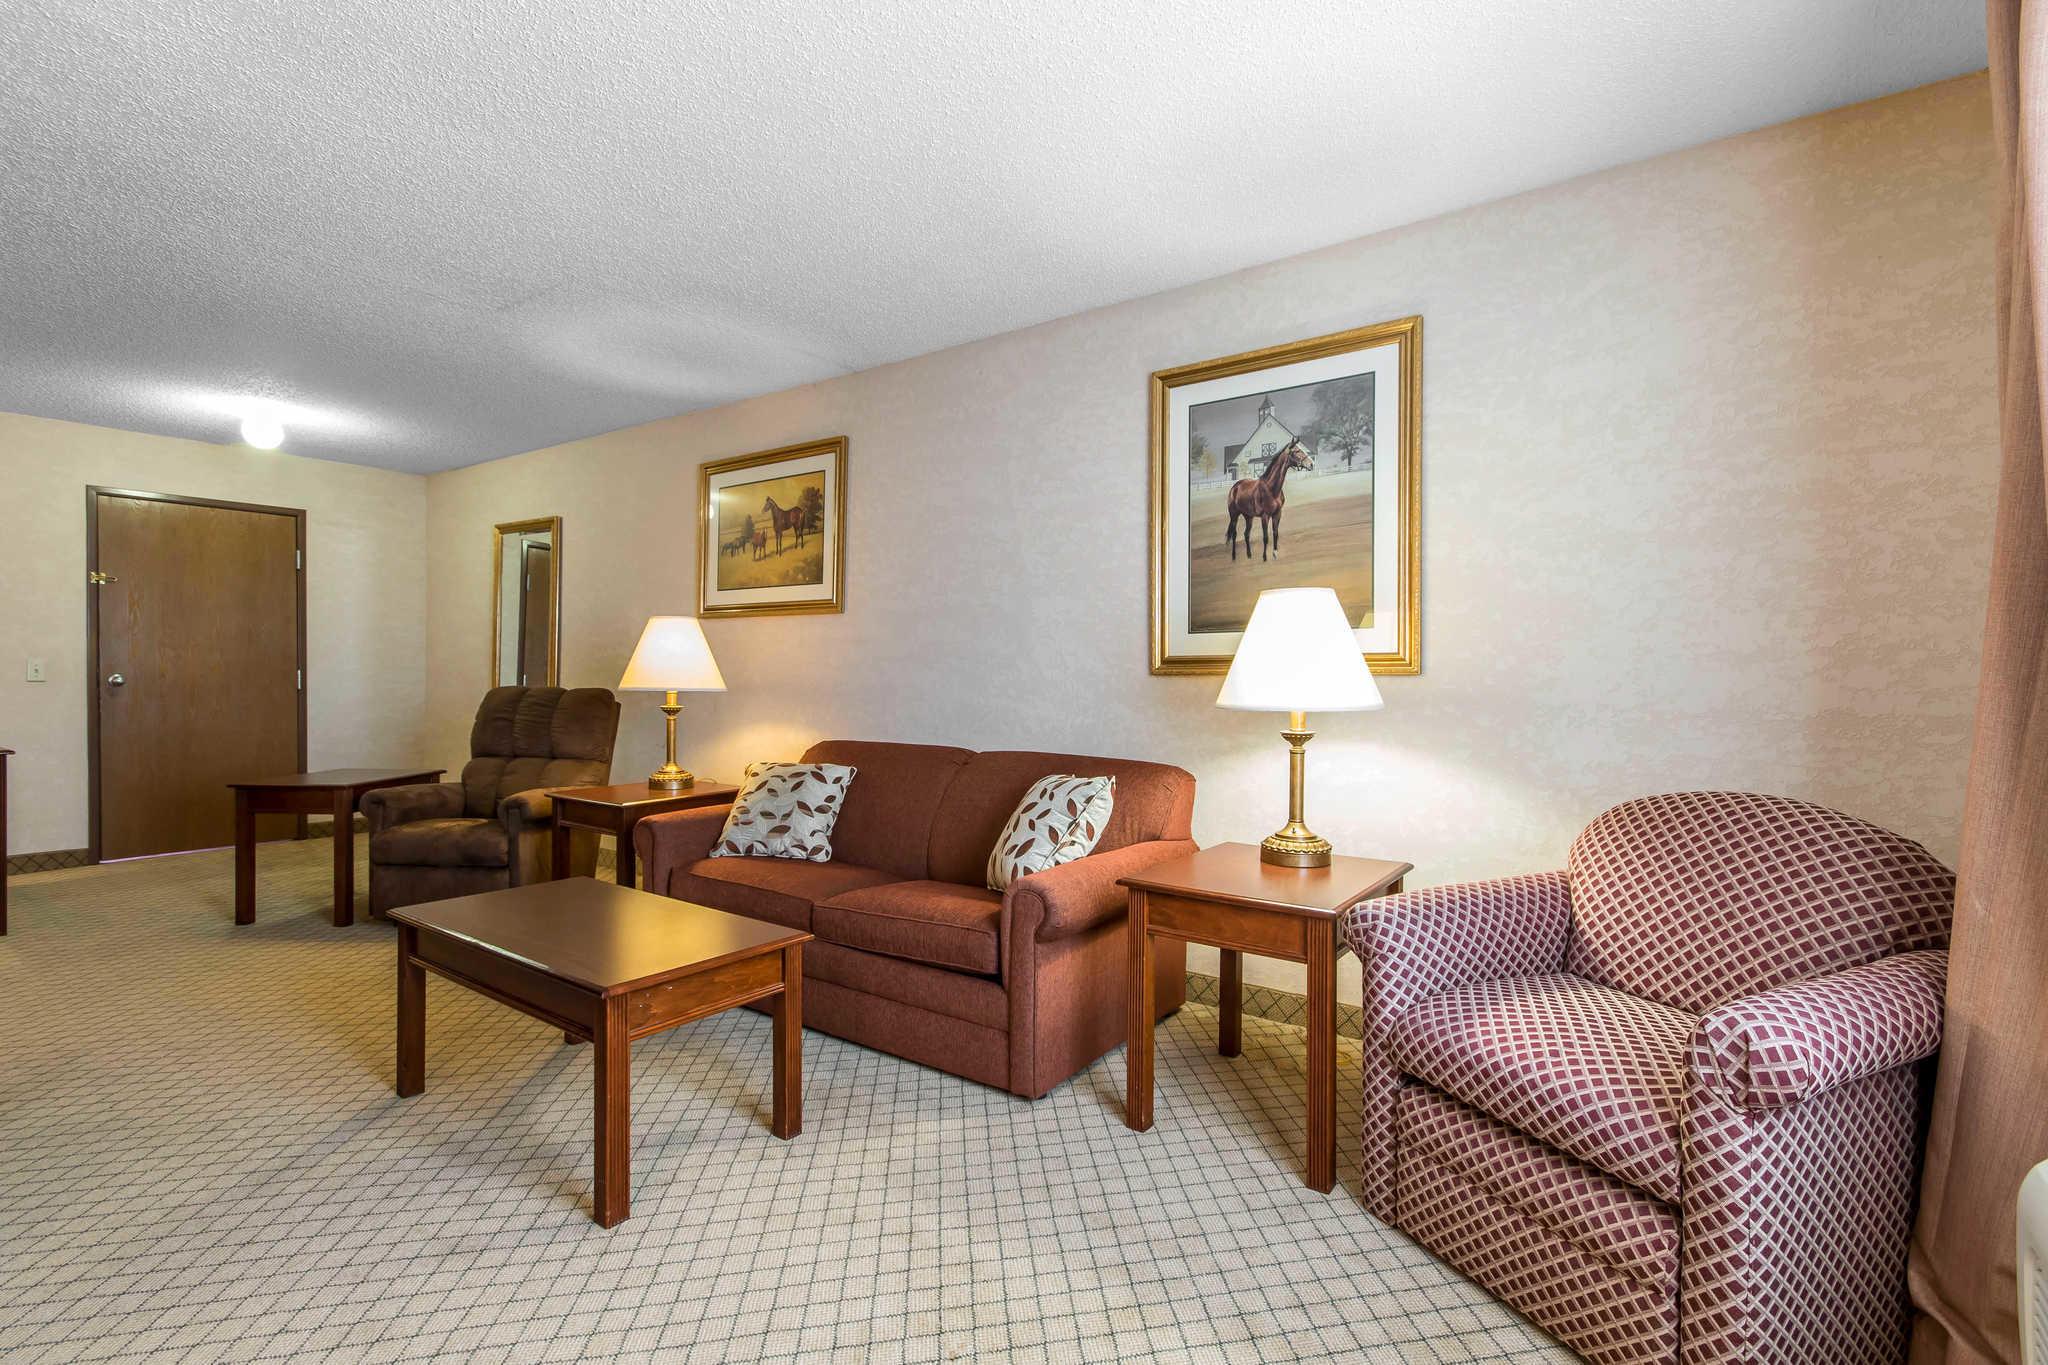 Hotel Rooms Danville Ky